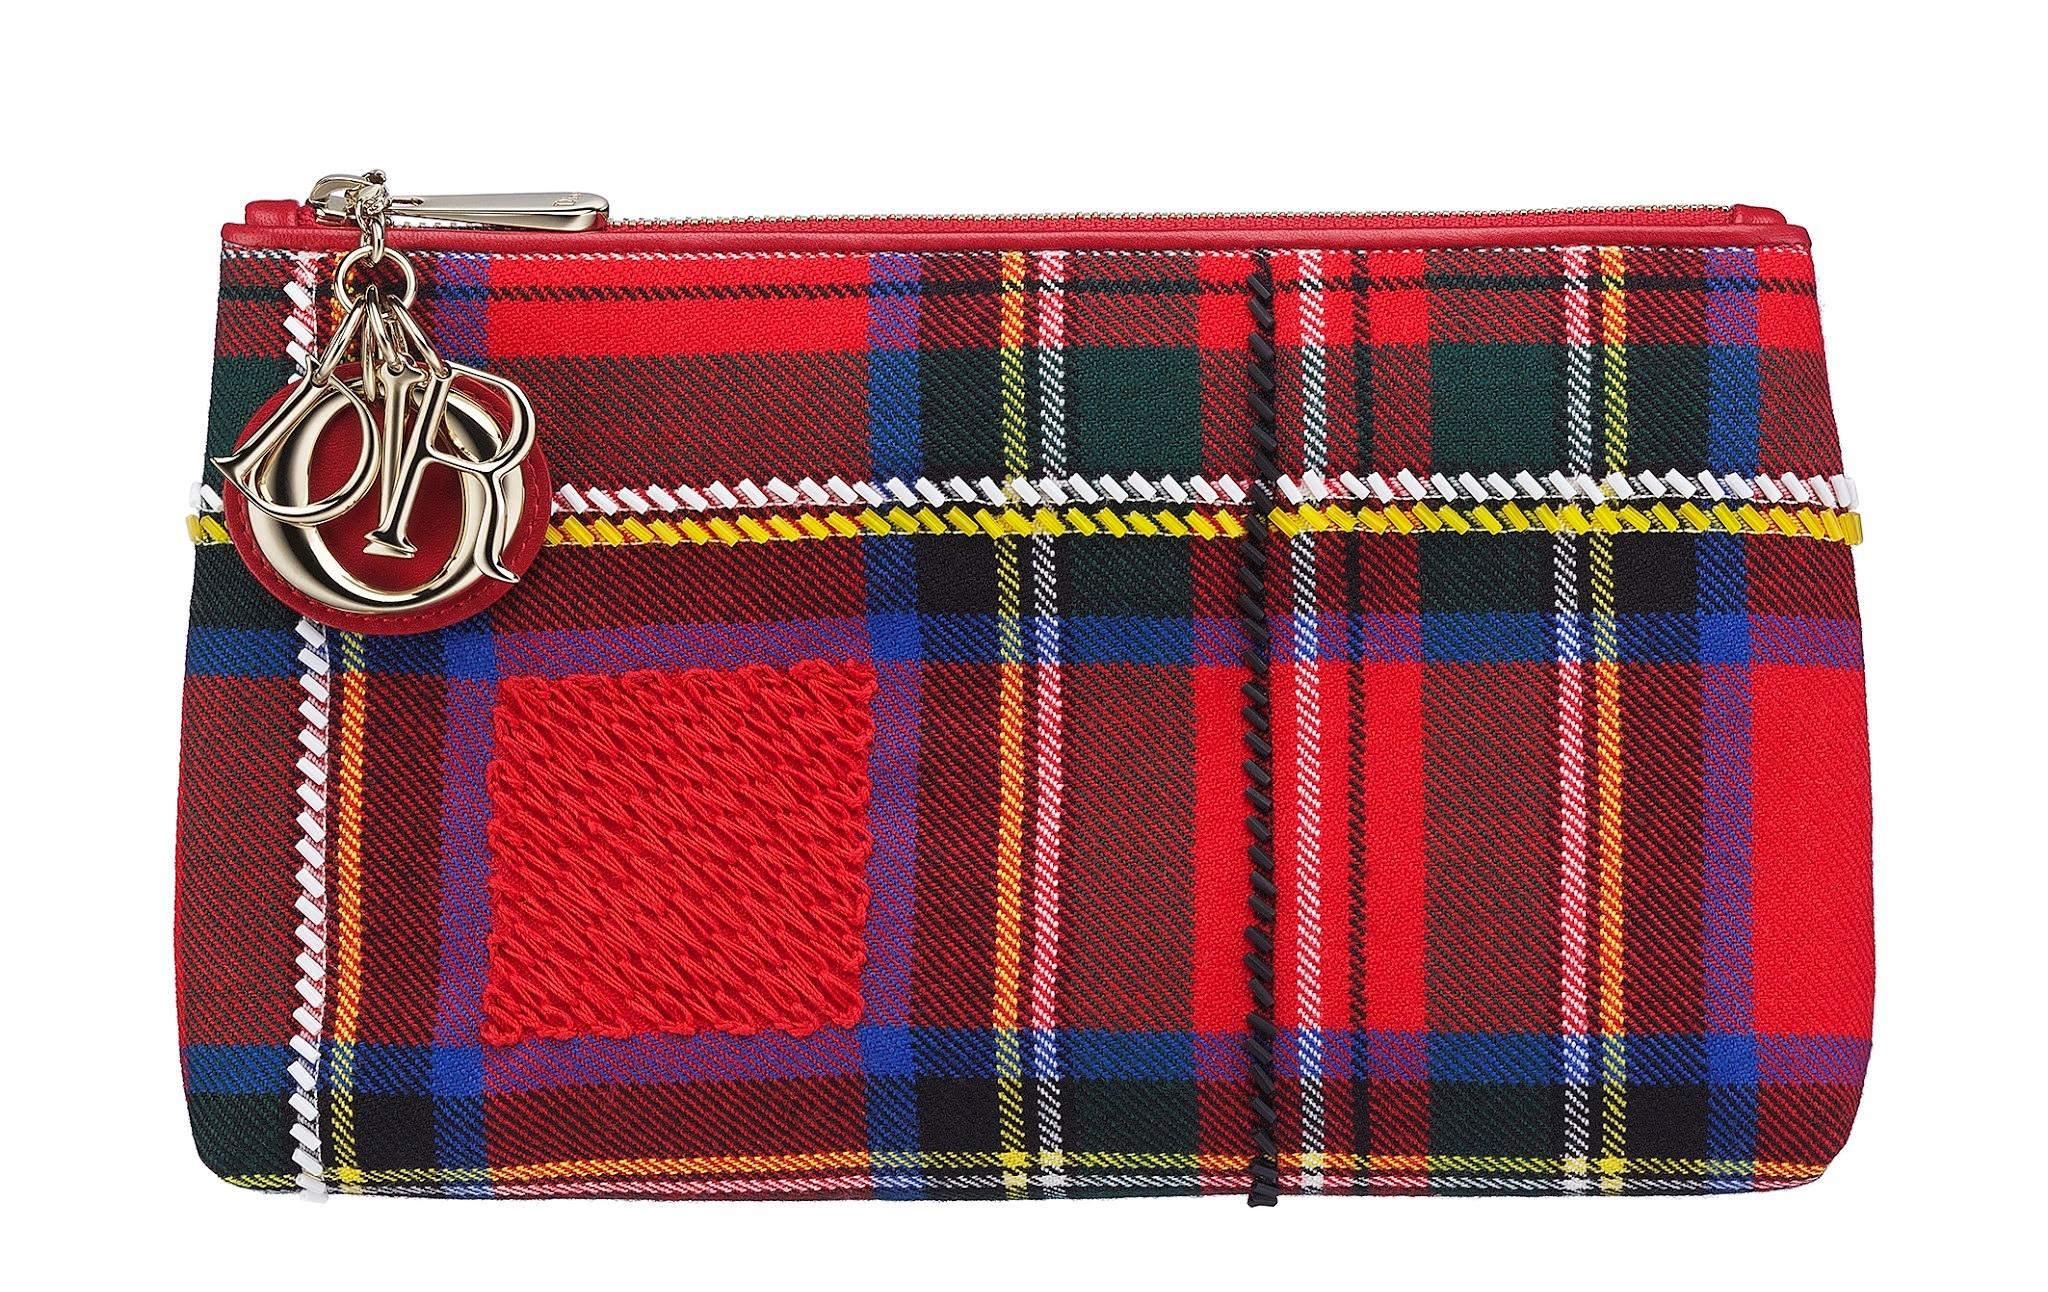 Christian-Dior-Lady-Dior-red-tartan-zipped-pouch